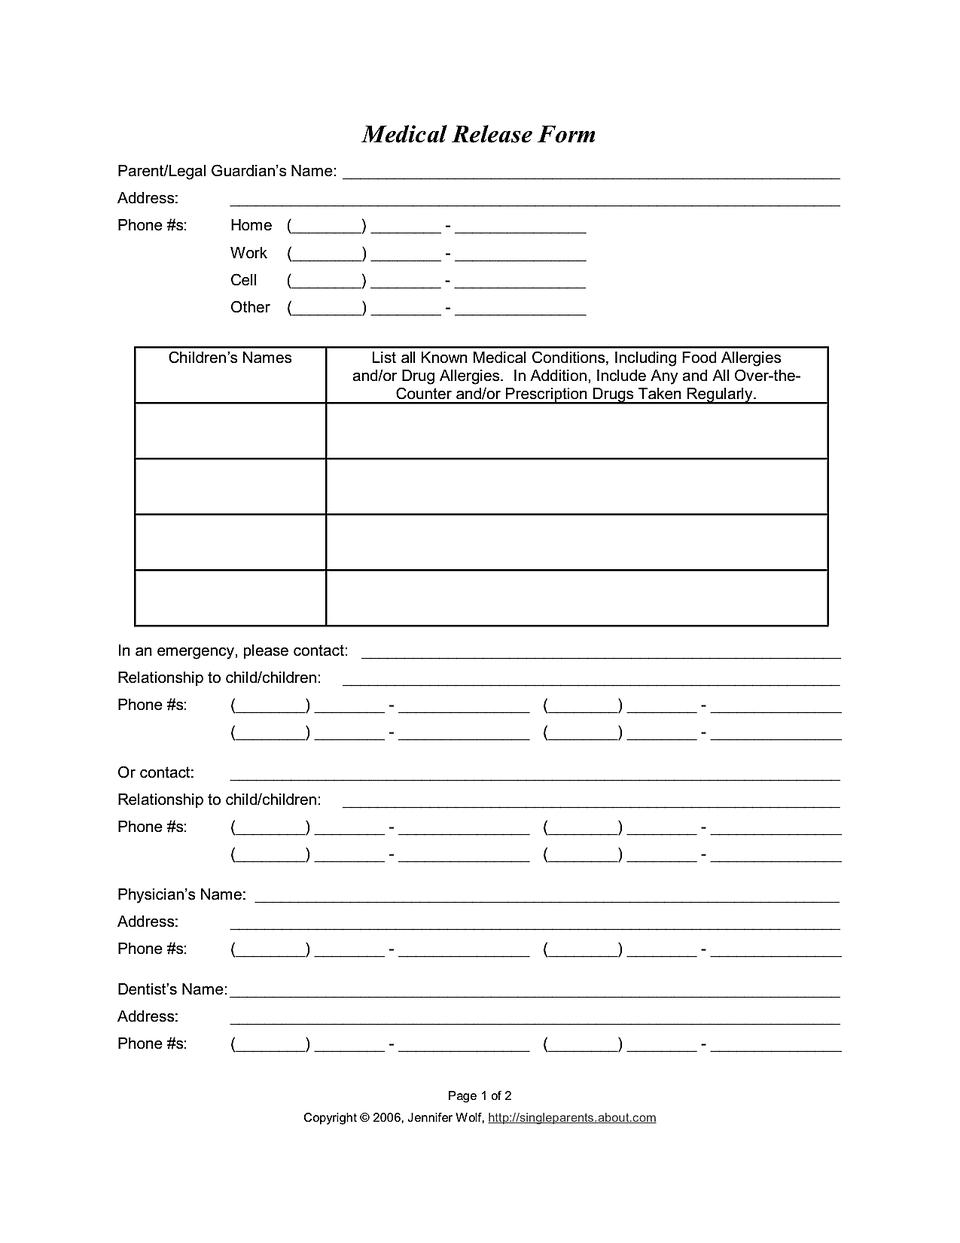 Child Medical Release Form - Free Printable Medical Release Form